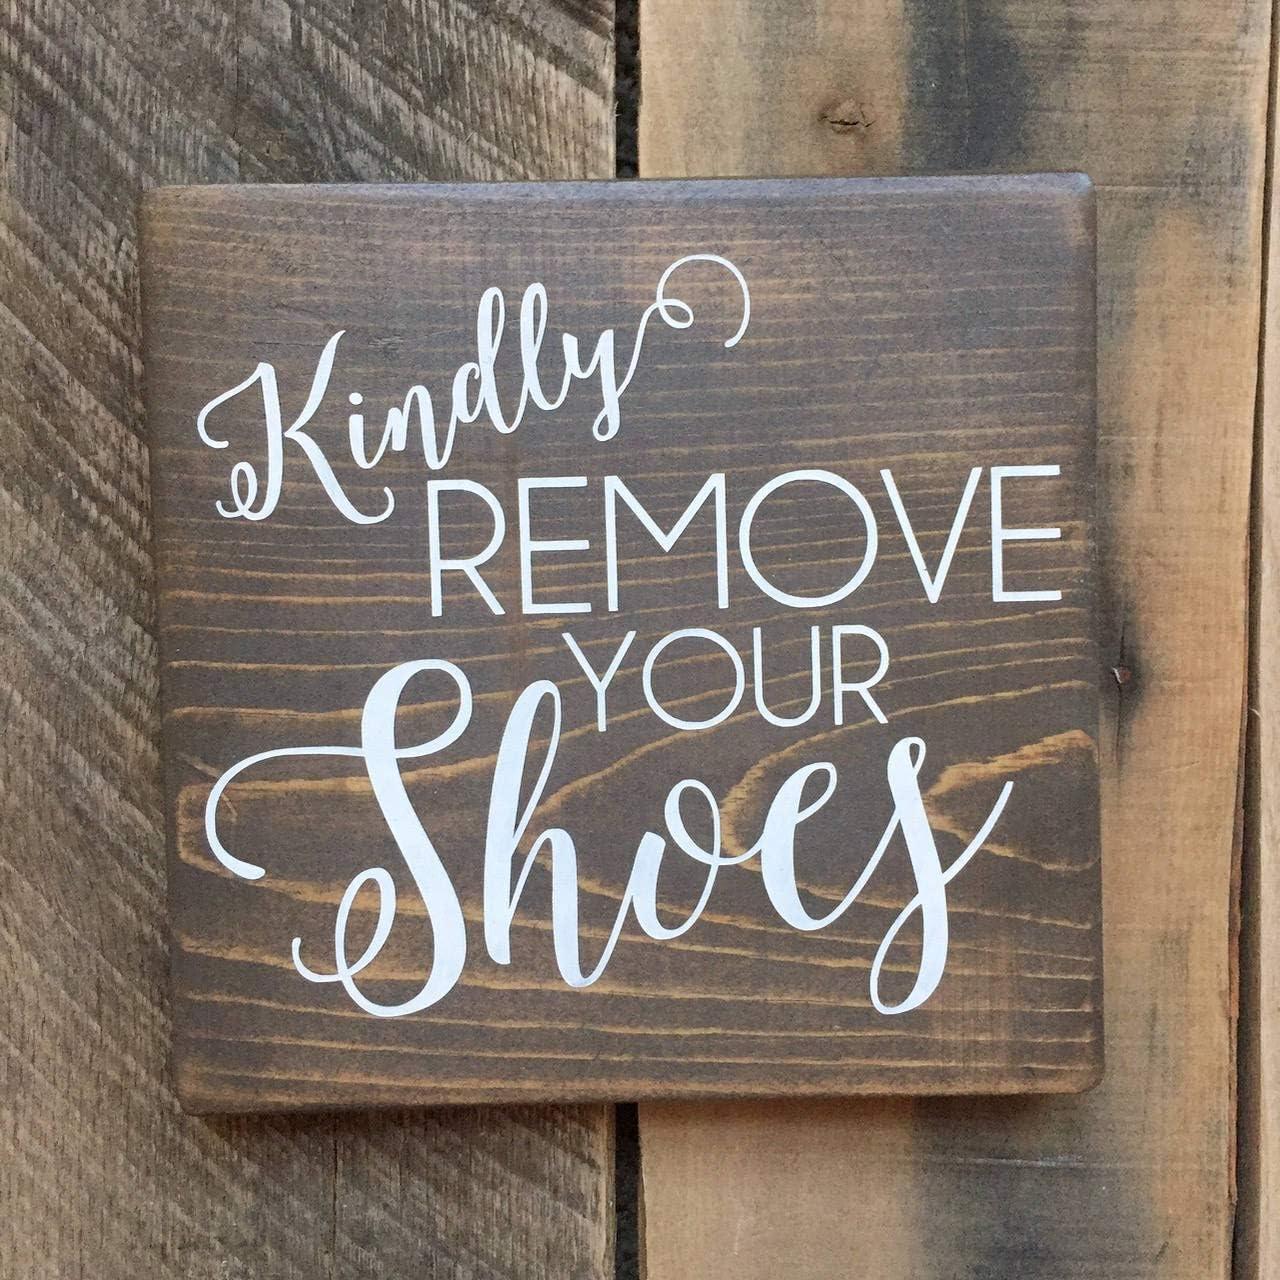 Please Remove Shoes Blue Bird Wooden Cutout Wood Block Vinyl Sign Take Shoes Off Sign Home Decor Door Hanger Wreath Accent Housewarming Gift